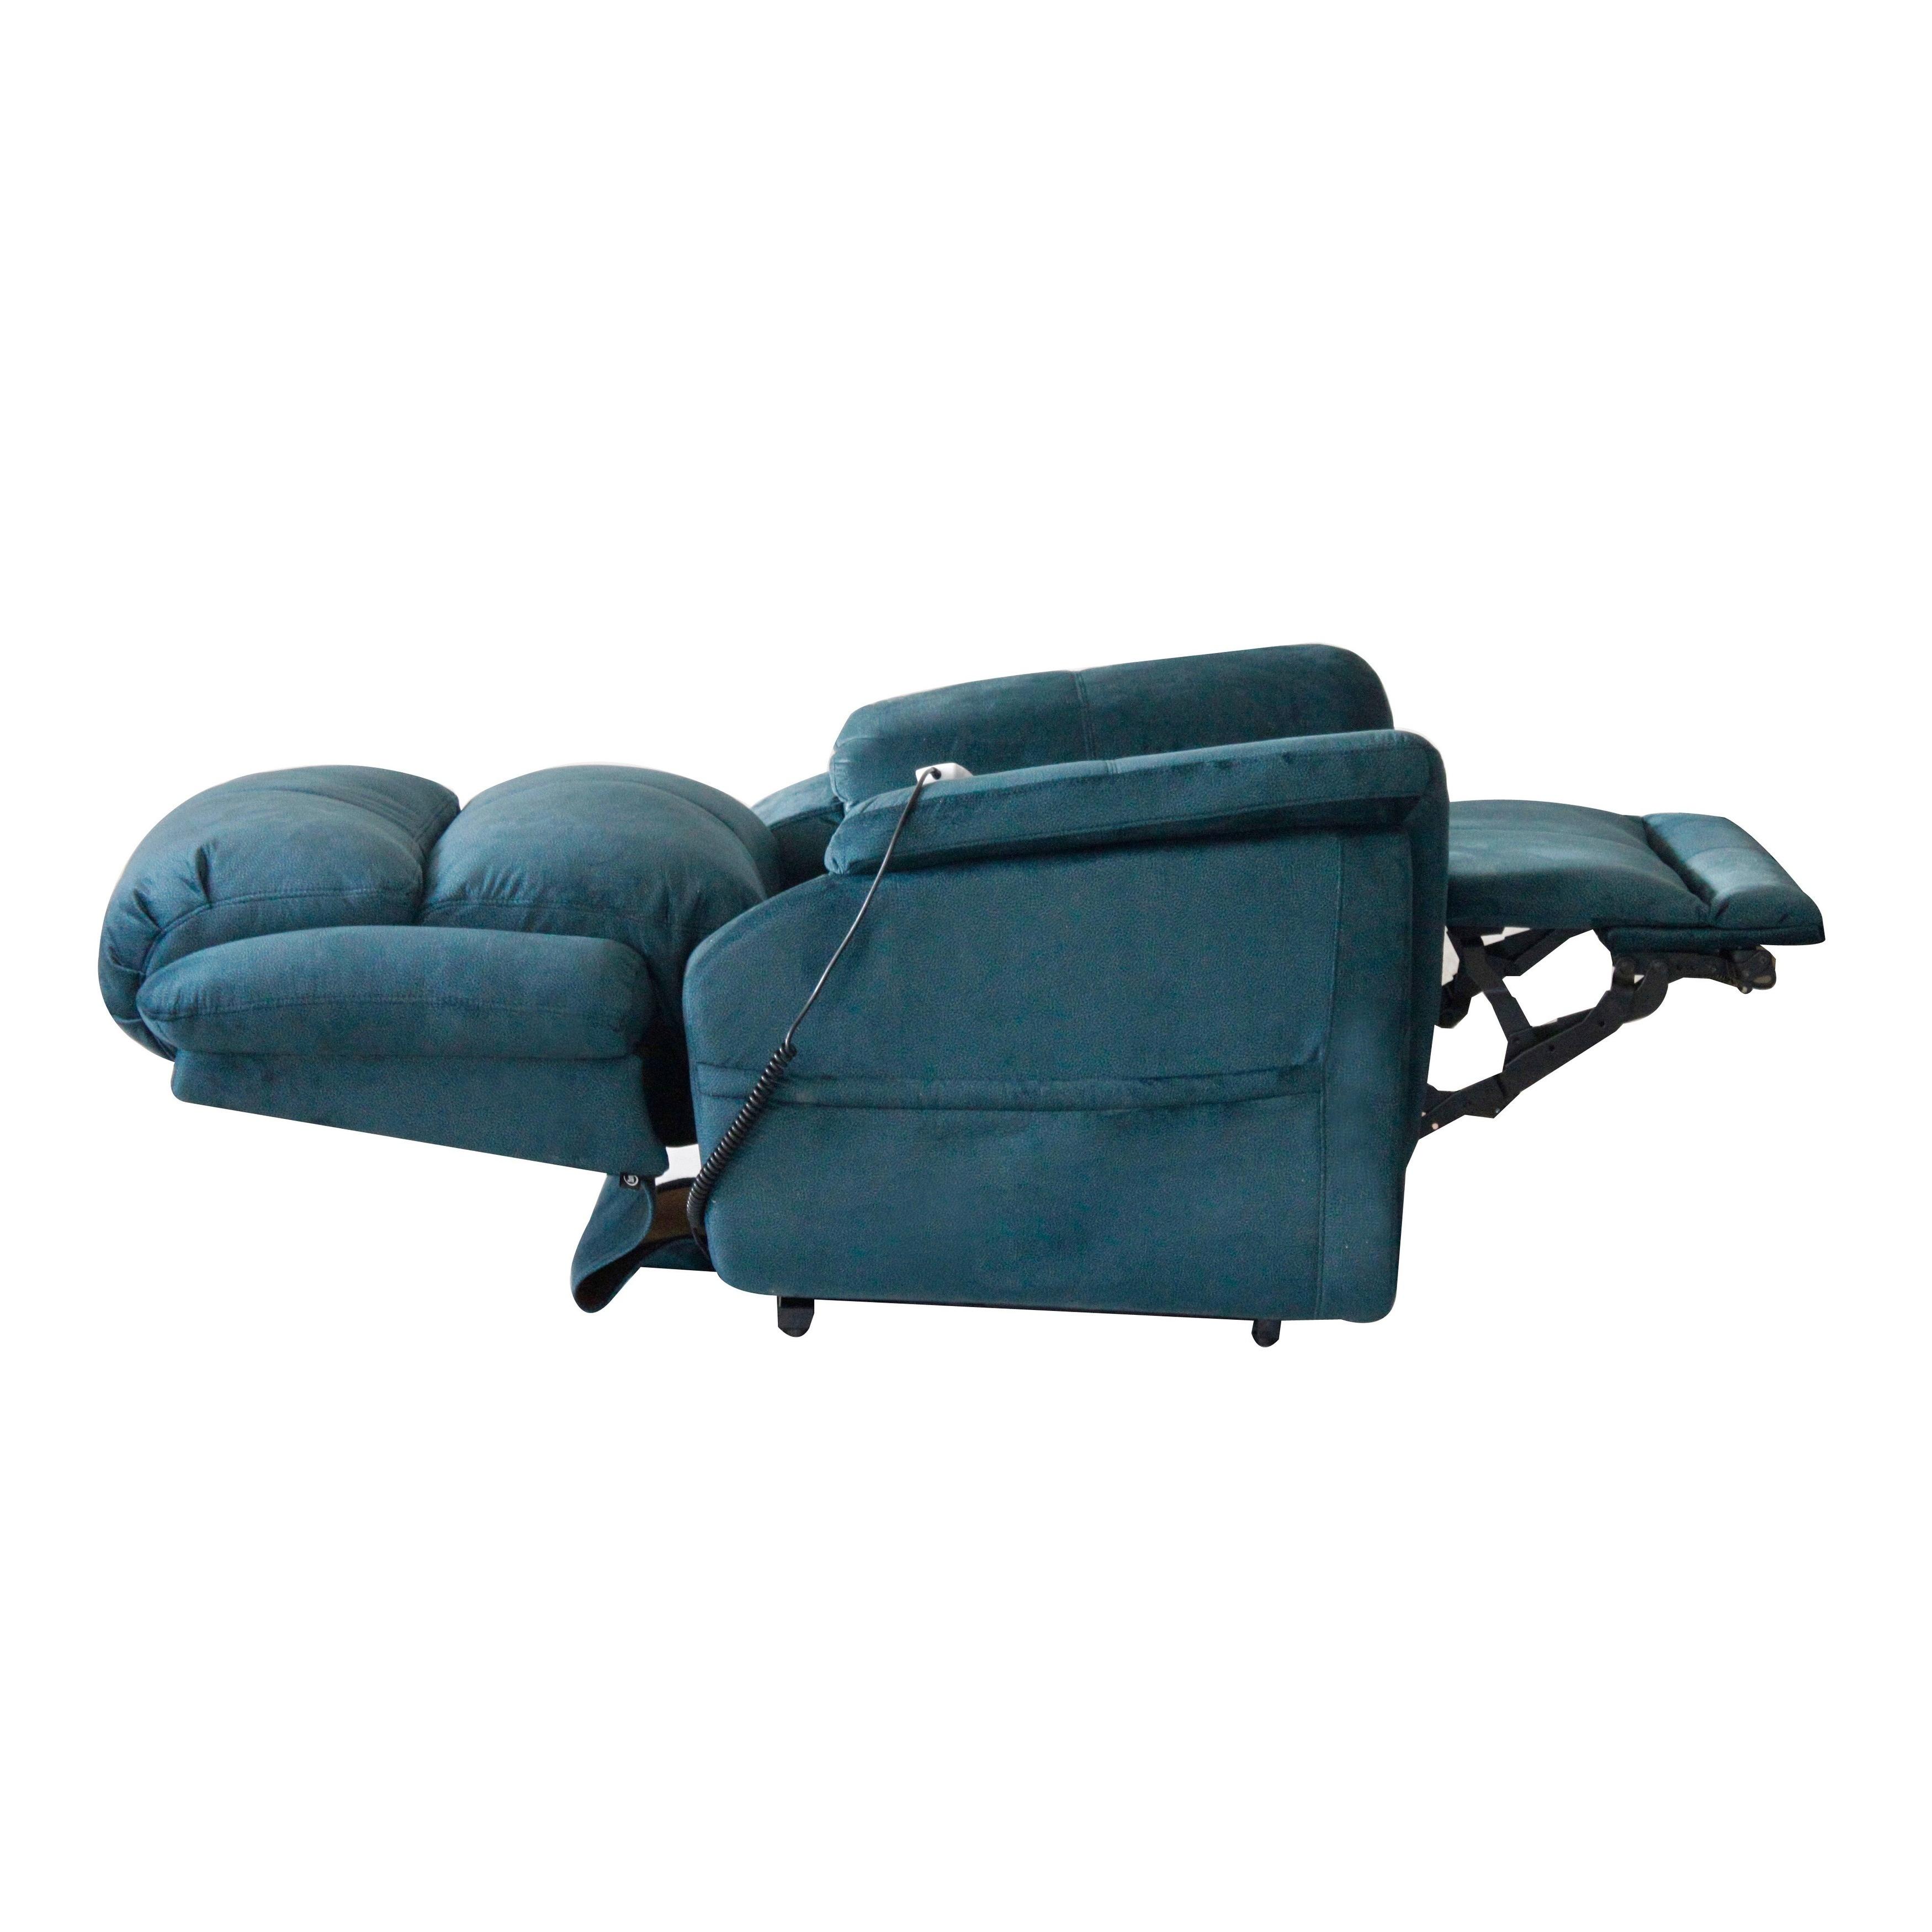 ip serta protector recliner heated chair